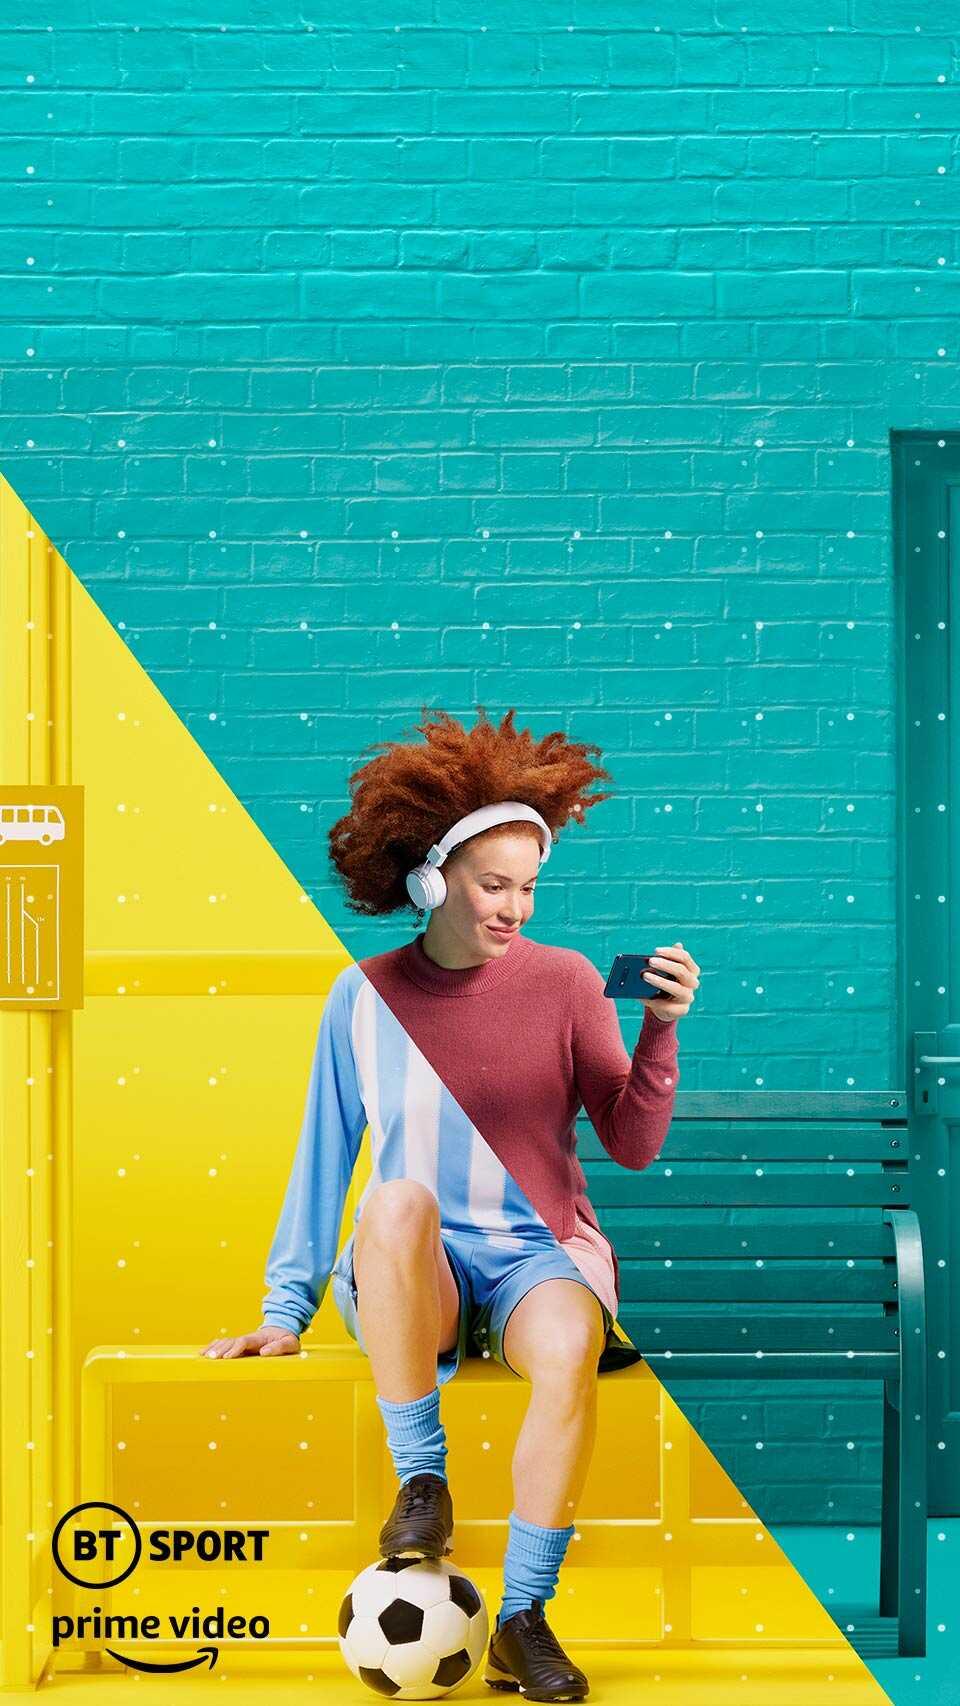 Superfast 5G & 4G Phones, Tablets and Fibre Broadband | EE